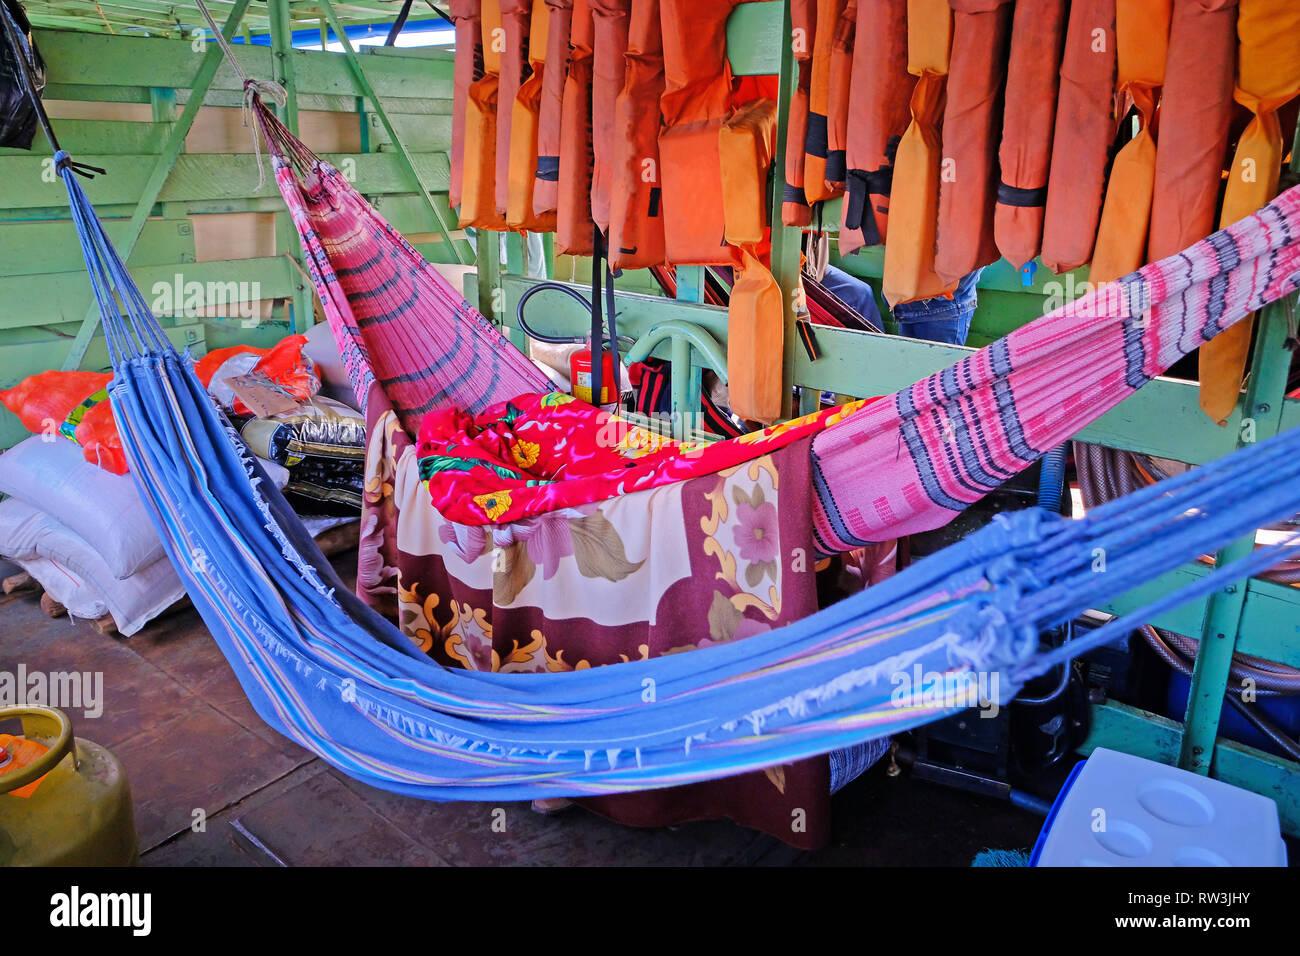 Hammocks on passengers deck on cattle pontoon boat on Rio Paraguay river, Corumba, Pantanal, Mato Grosso, Brazil - Stock Image